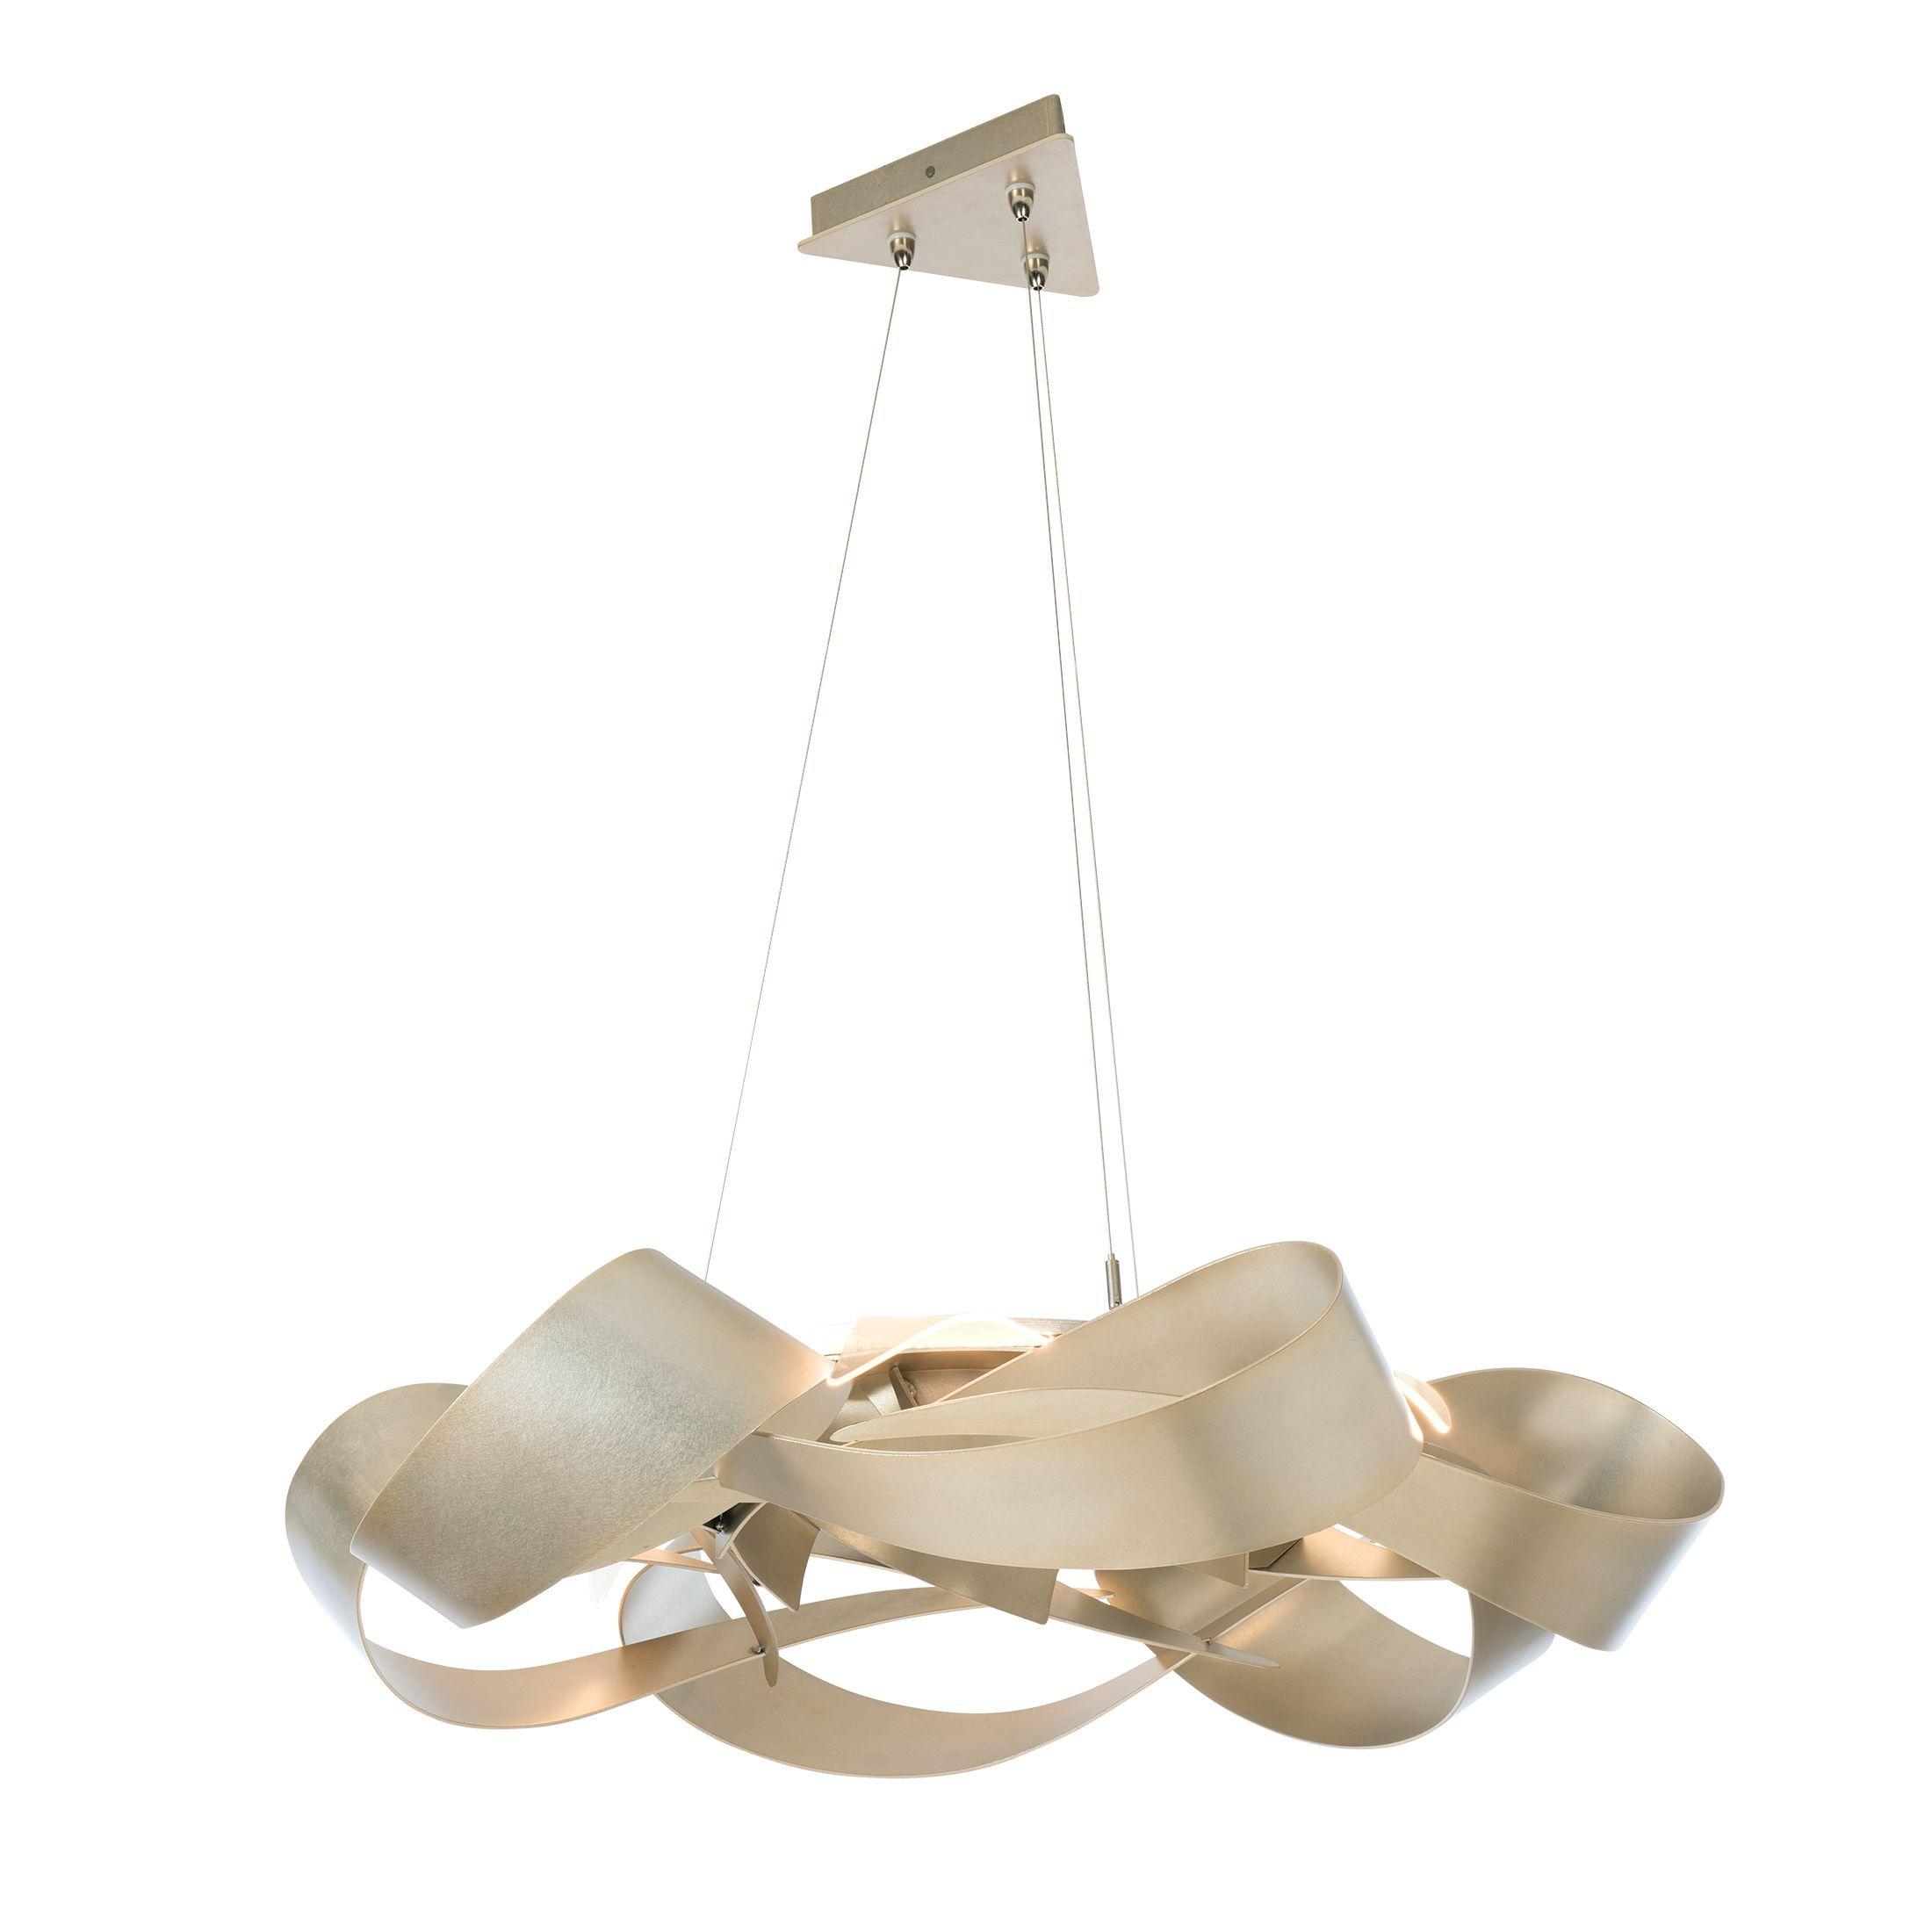 Hubbardton Forge Flux Large Led Pendant Our Scale Utilizes Six Separate Edge Lit Light Guides To Elegantly Illuminate The Soft Gold